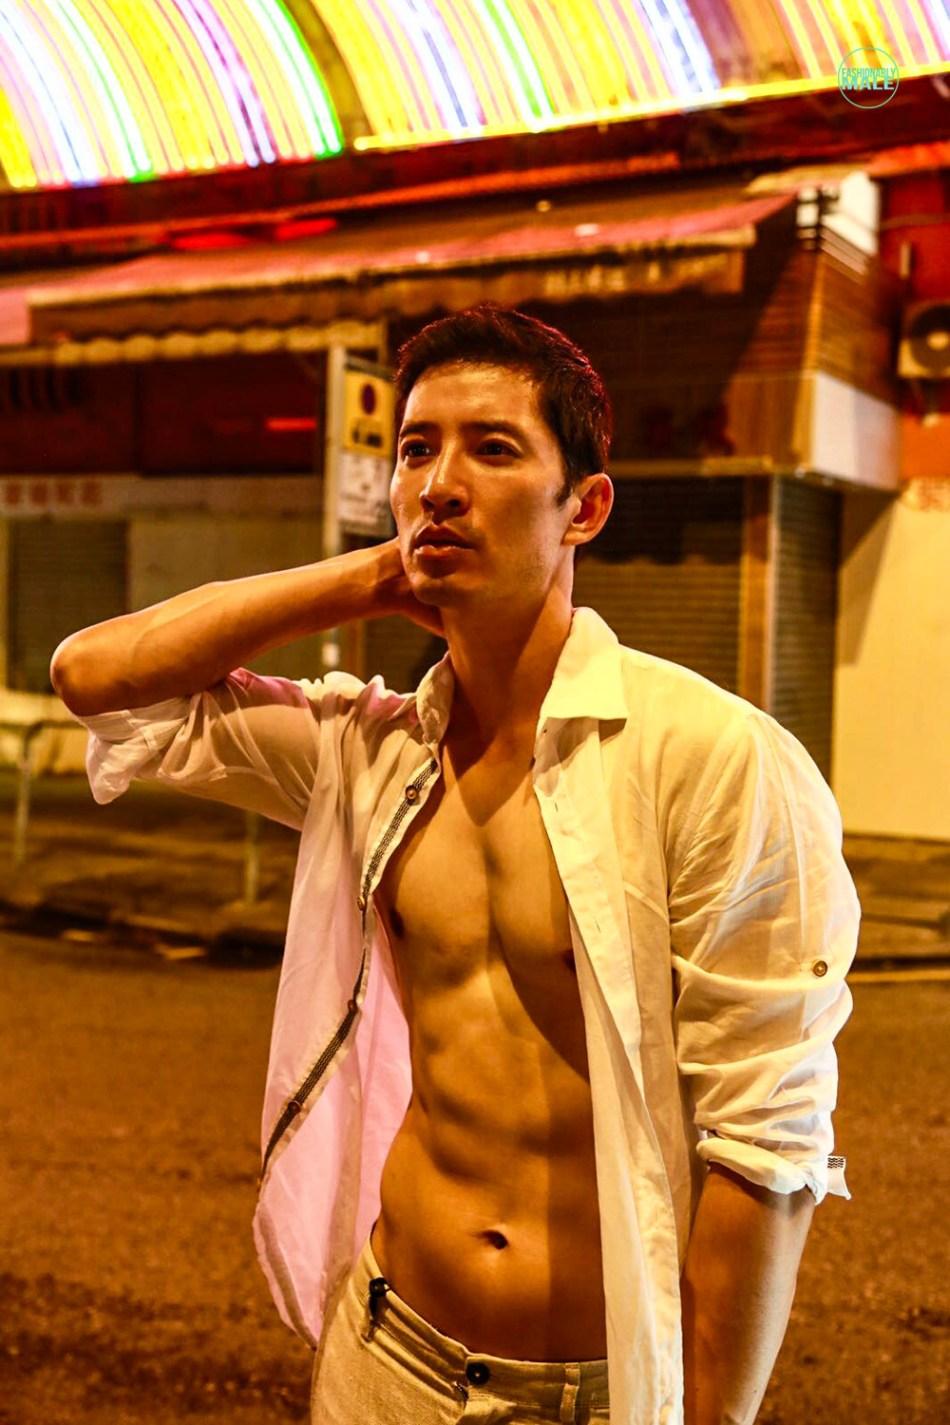 The Night Watchman Richie Kul by Wendy Loke for Fashionably Male14